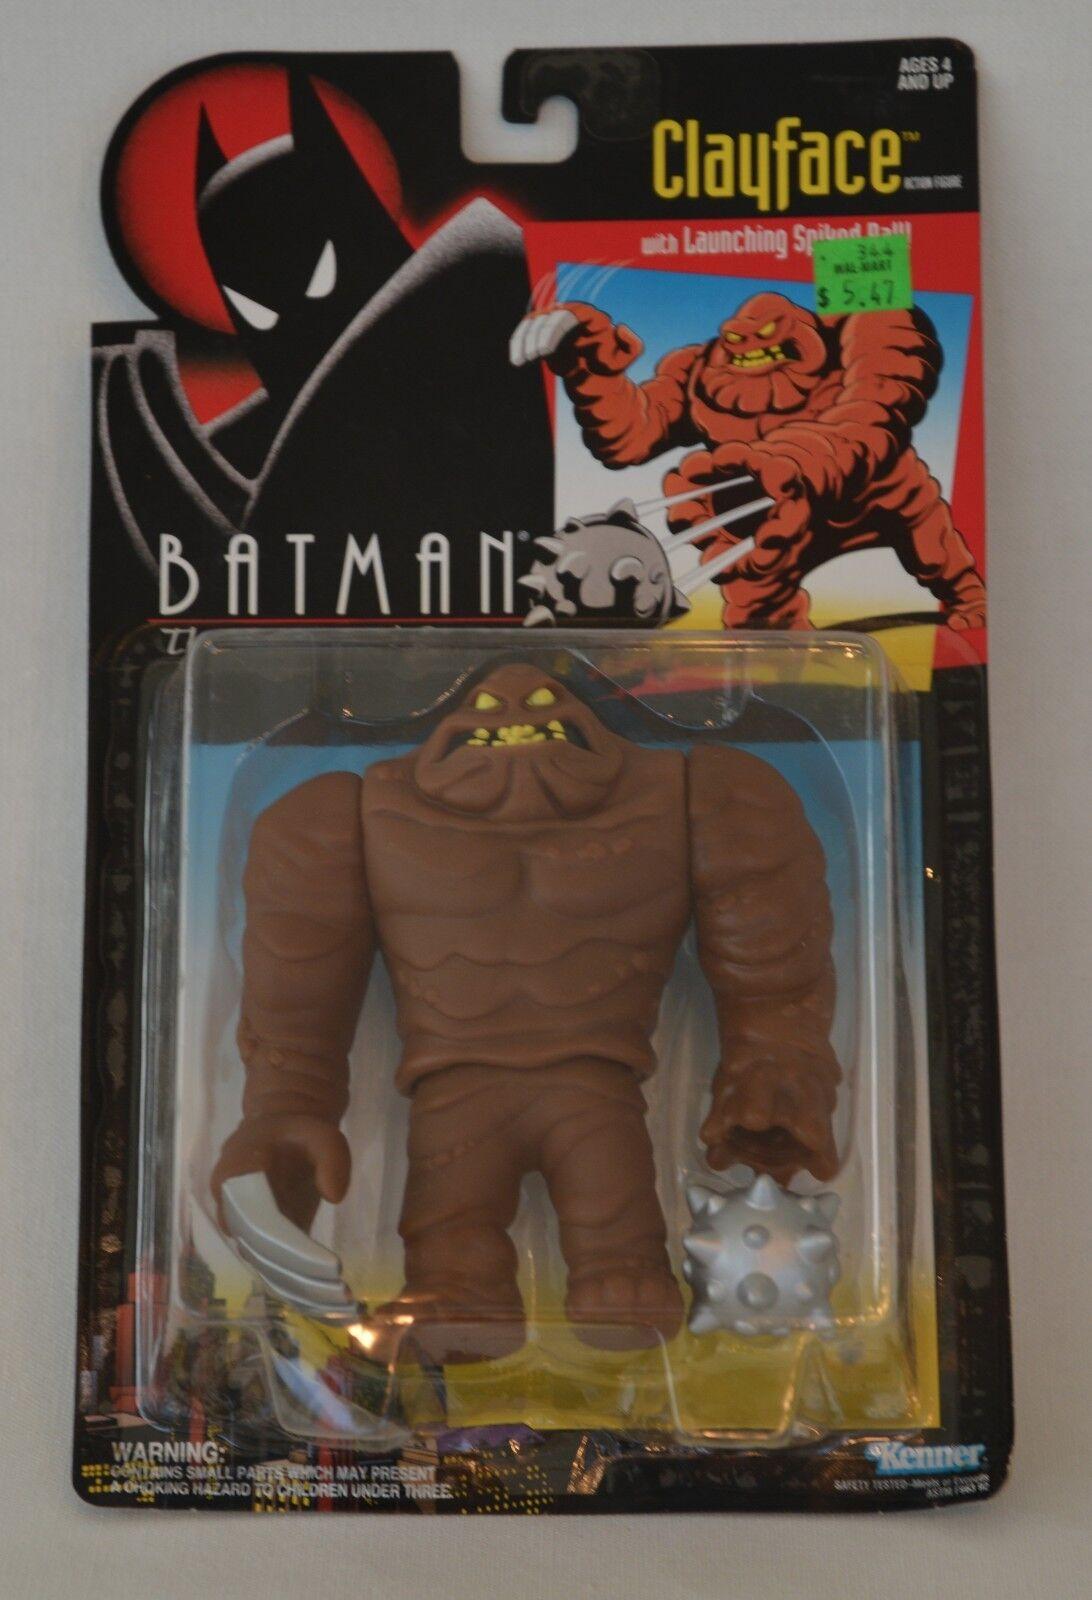 1993 DC COMICS BATMAN THE ANIMATED SERIES